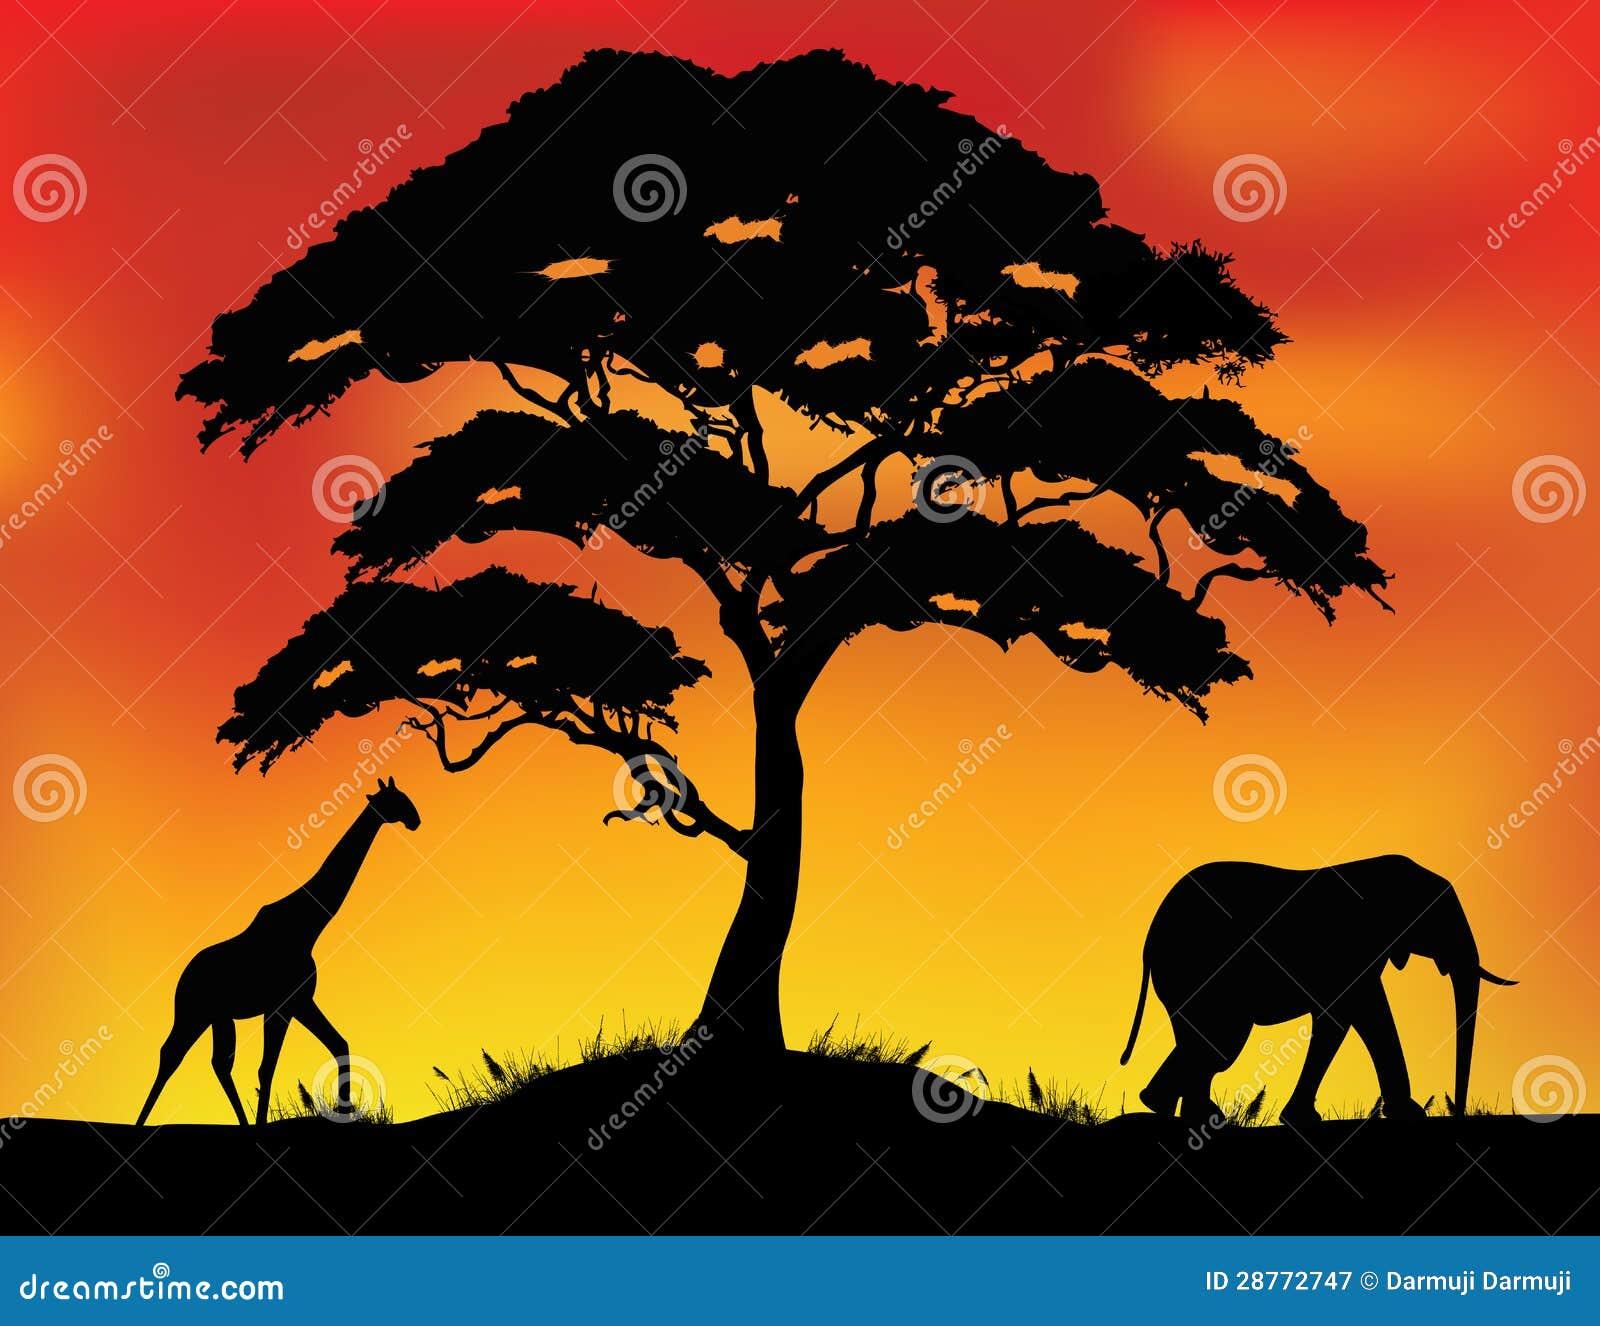 Baby elephant silhouette